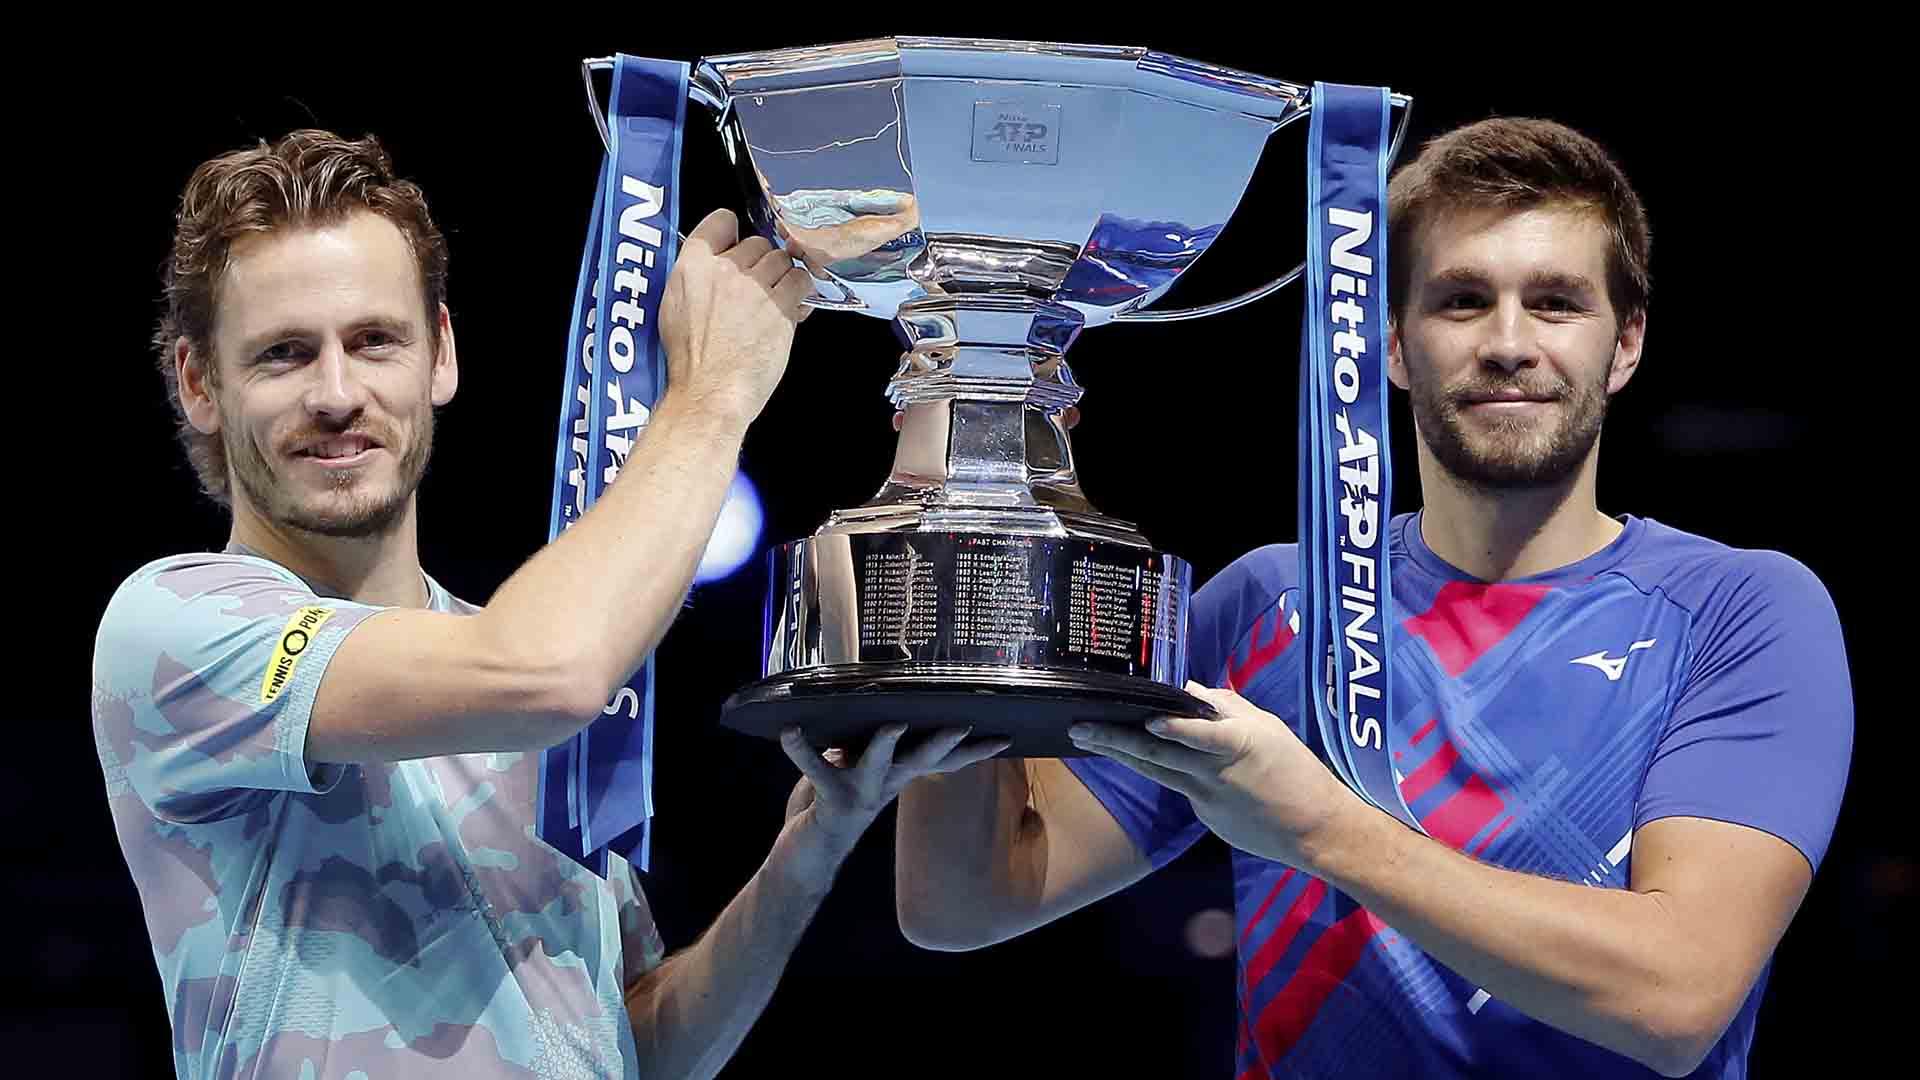 Wesley Koolhof and Nikola Mektic end their 2020 ATP Tour season with a 24-13 team record.